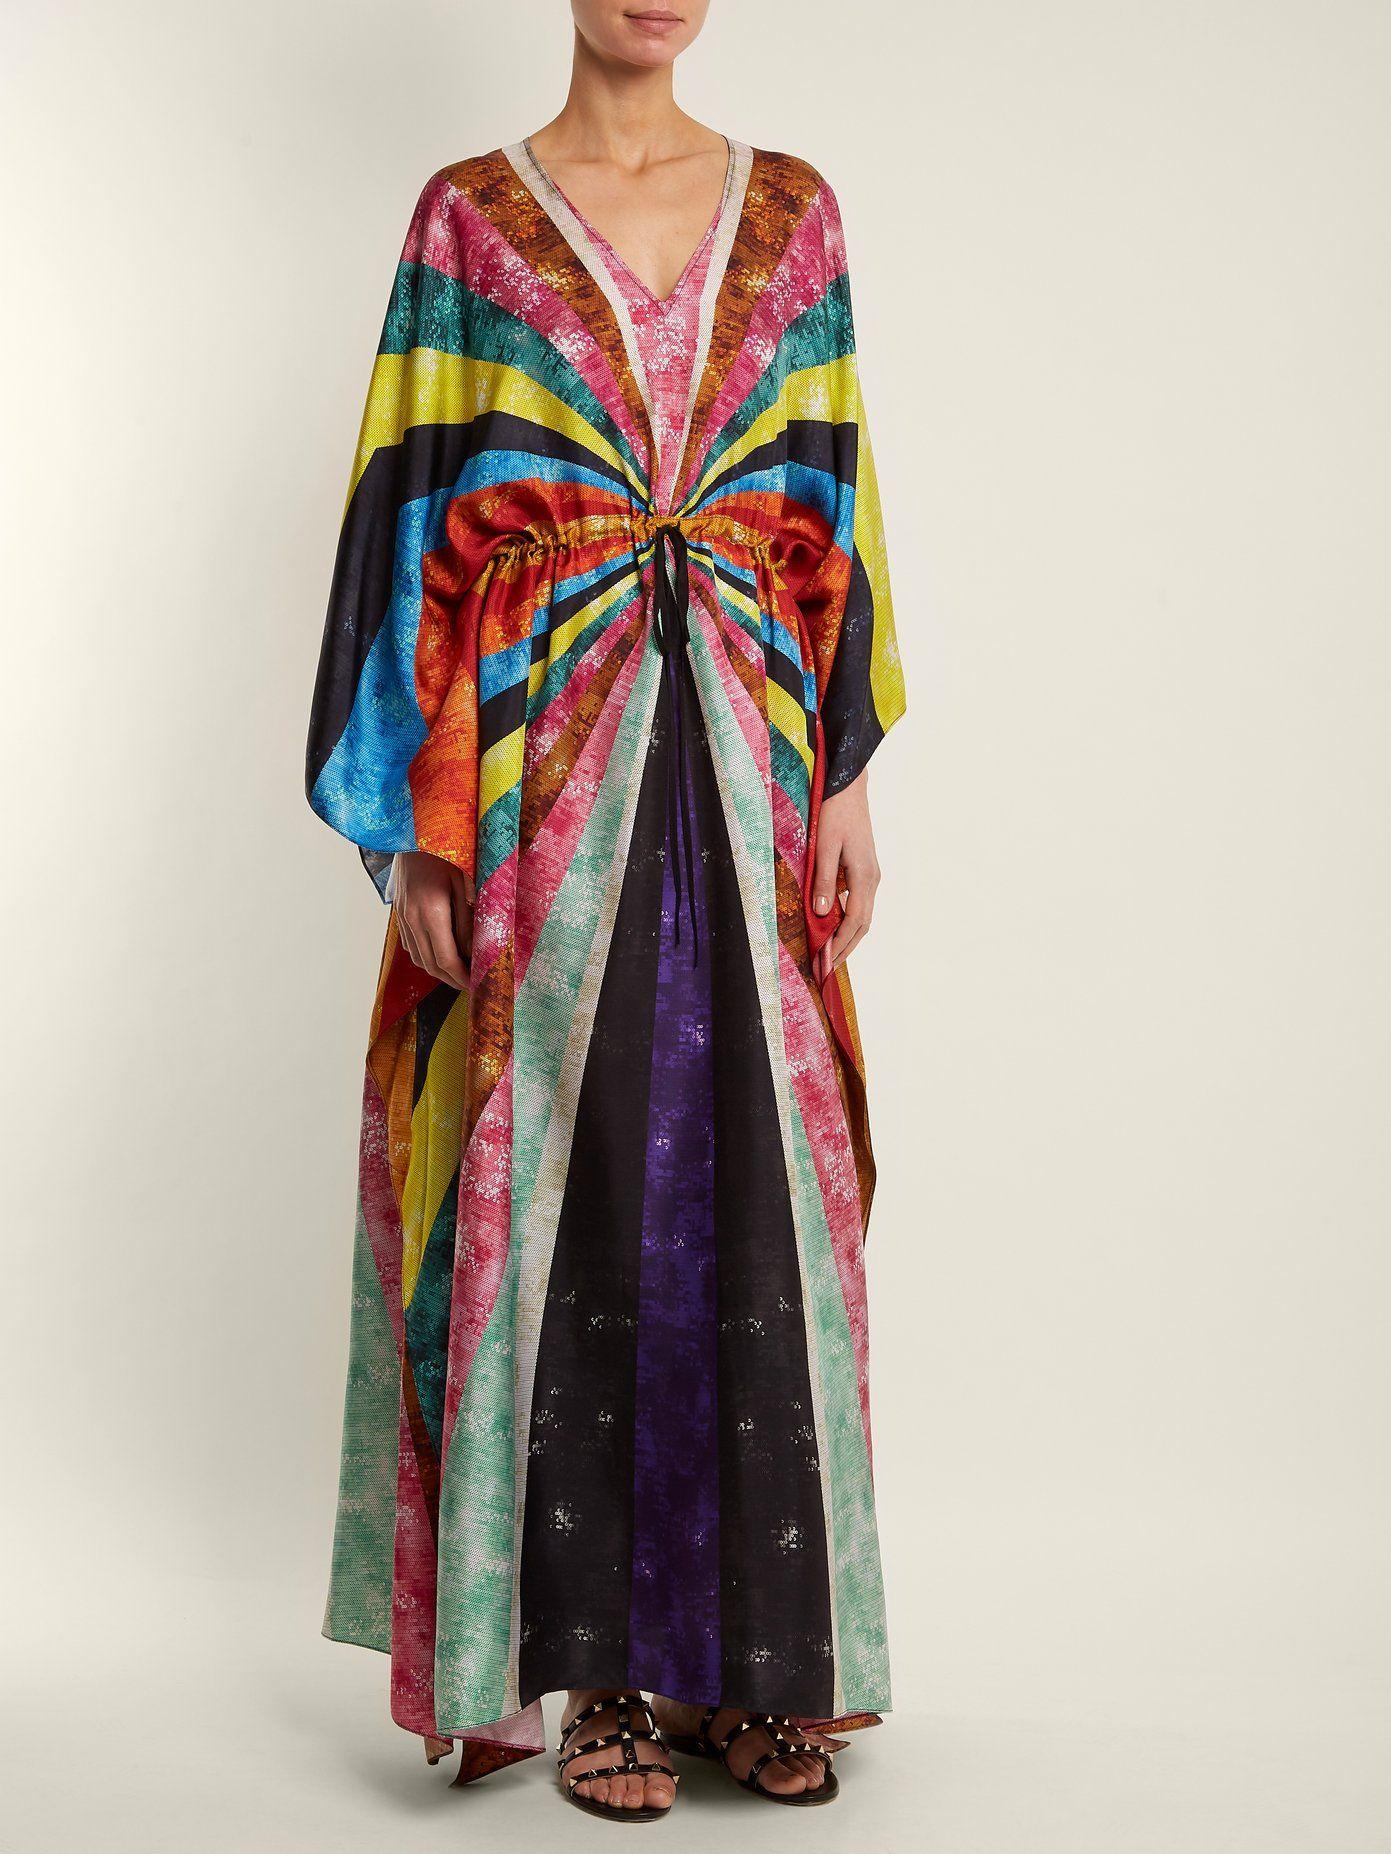 Discount High Quality Asso silk kaftan Mary Katrantzou Free Shipping Finishline Outlet Latest Sale Shop Offer 1JISTP